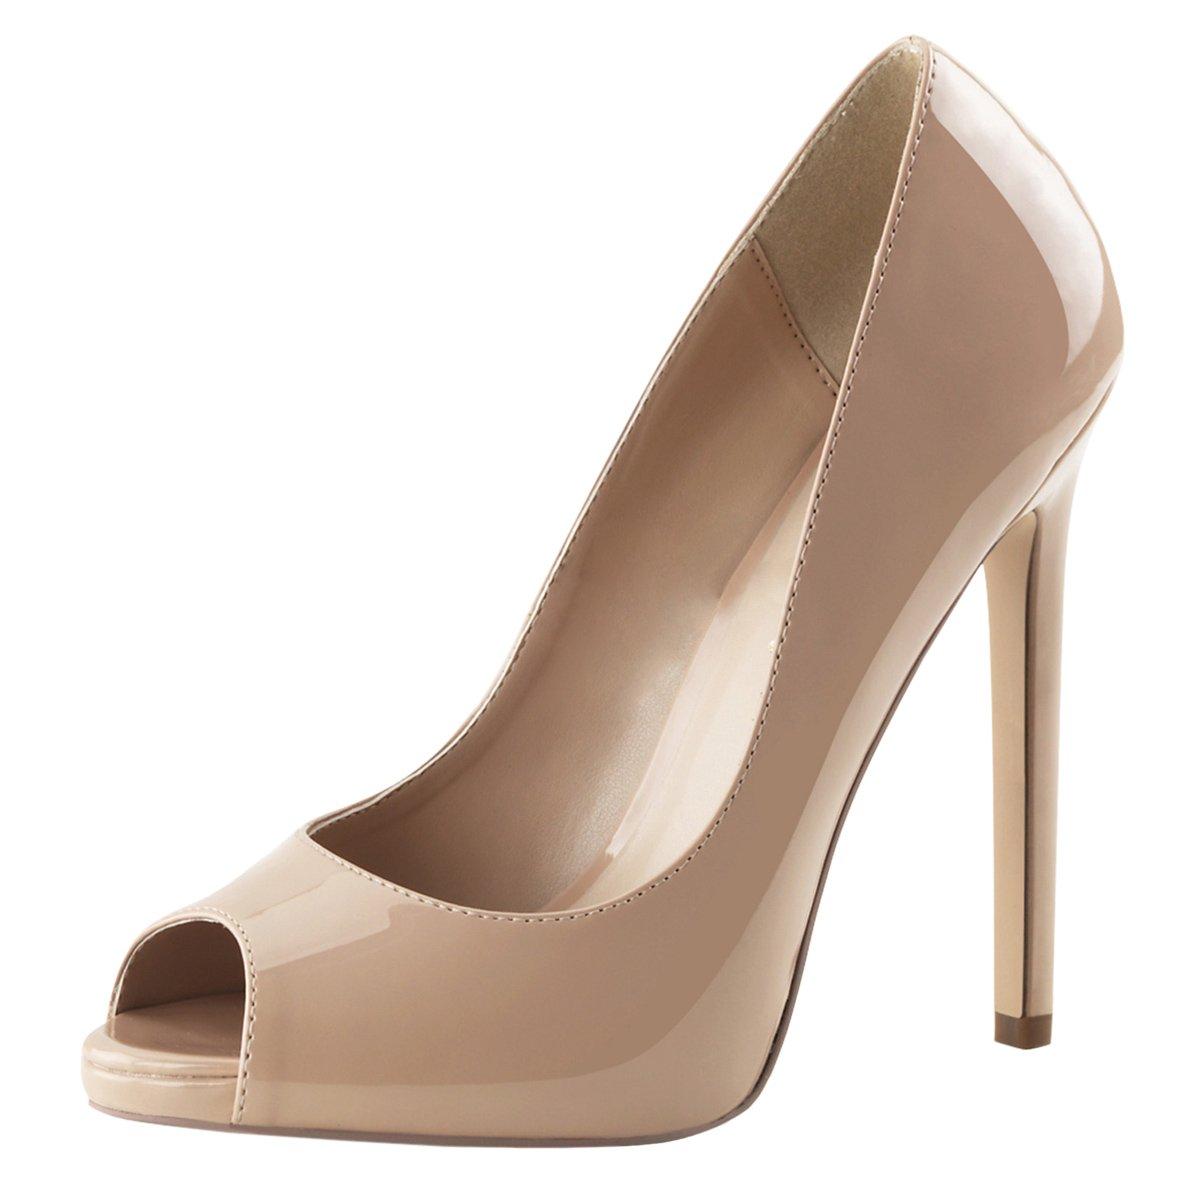 62c0e6553c7e2 Amazon.com | Womens Nude High Heels Peep Toe Pumps Platform Shoes ...